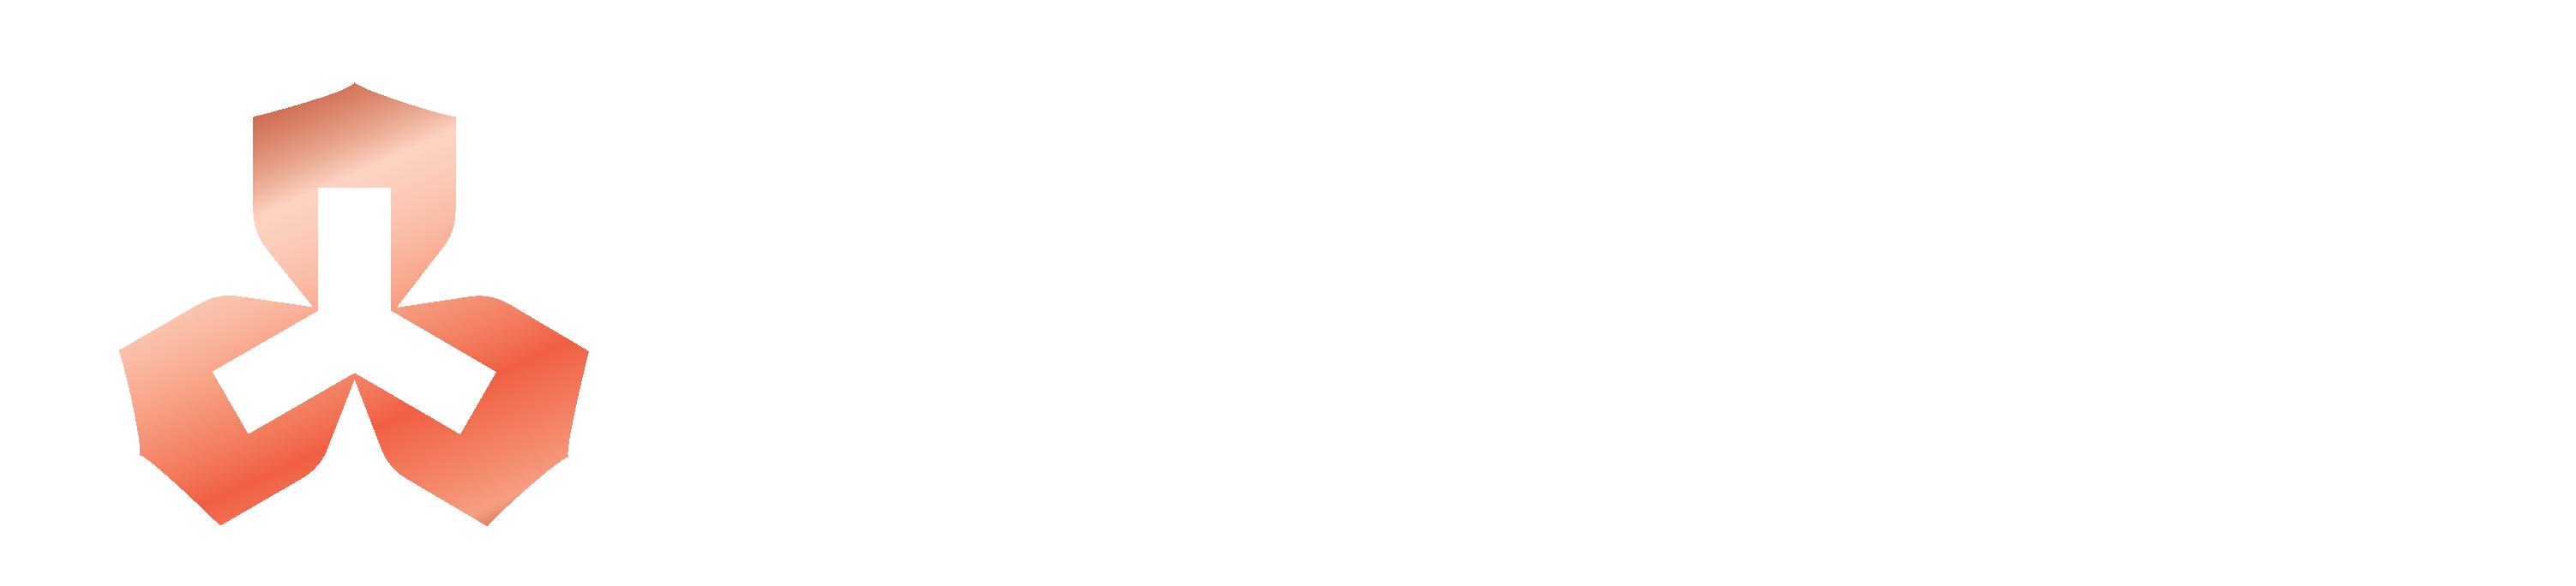 hhc_logo-02-1